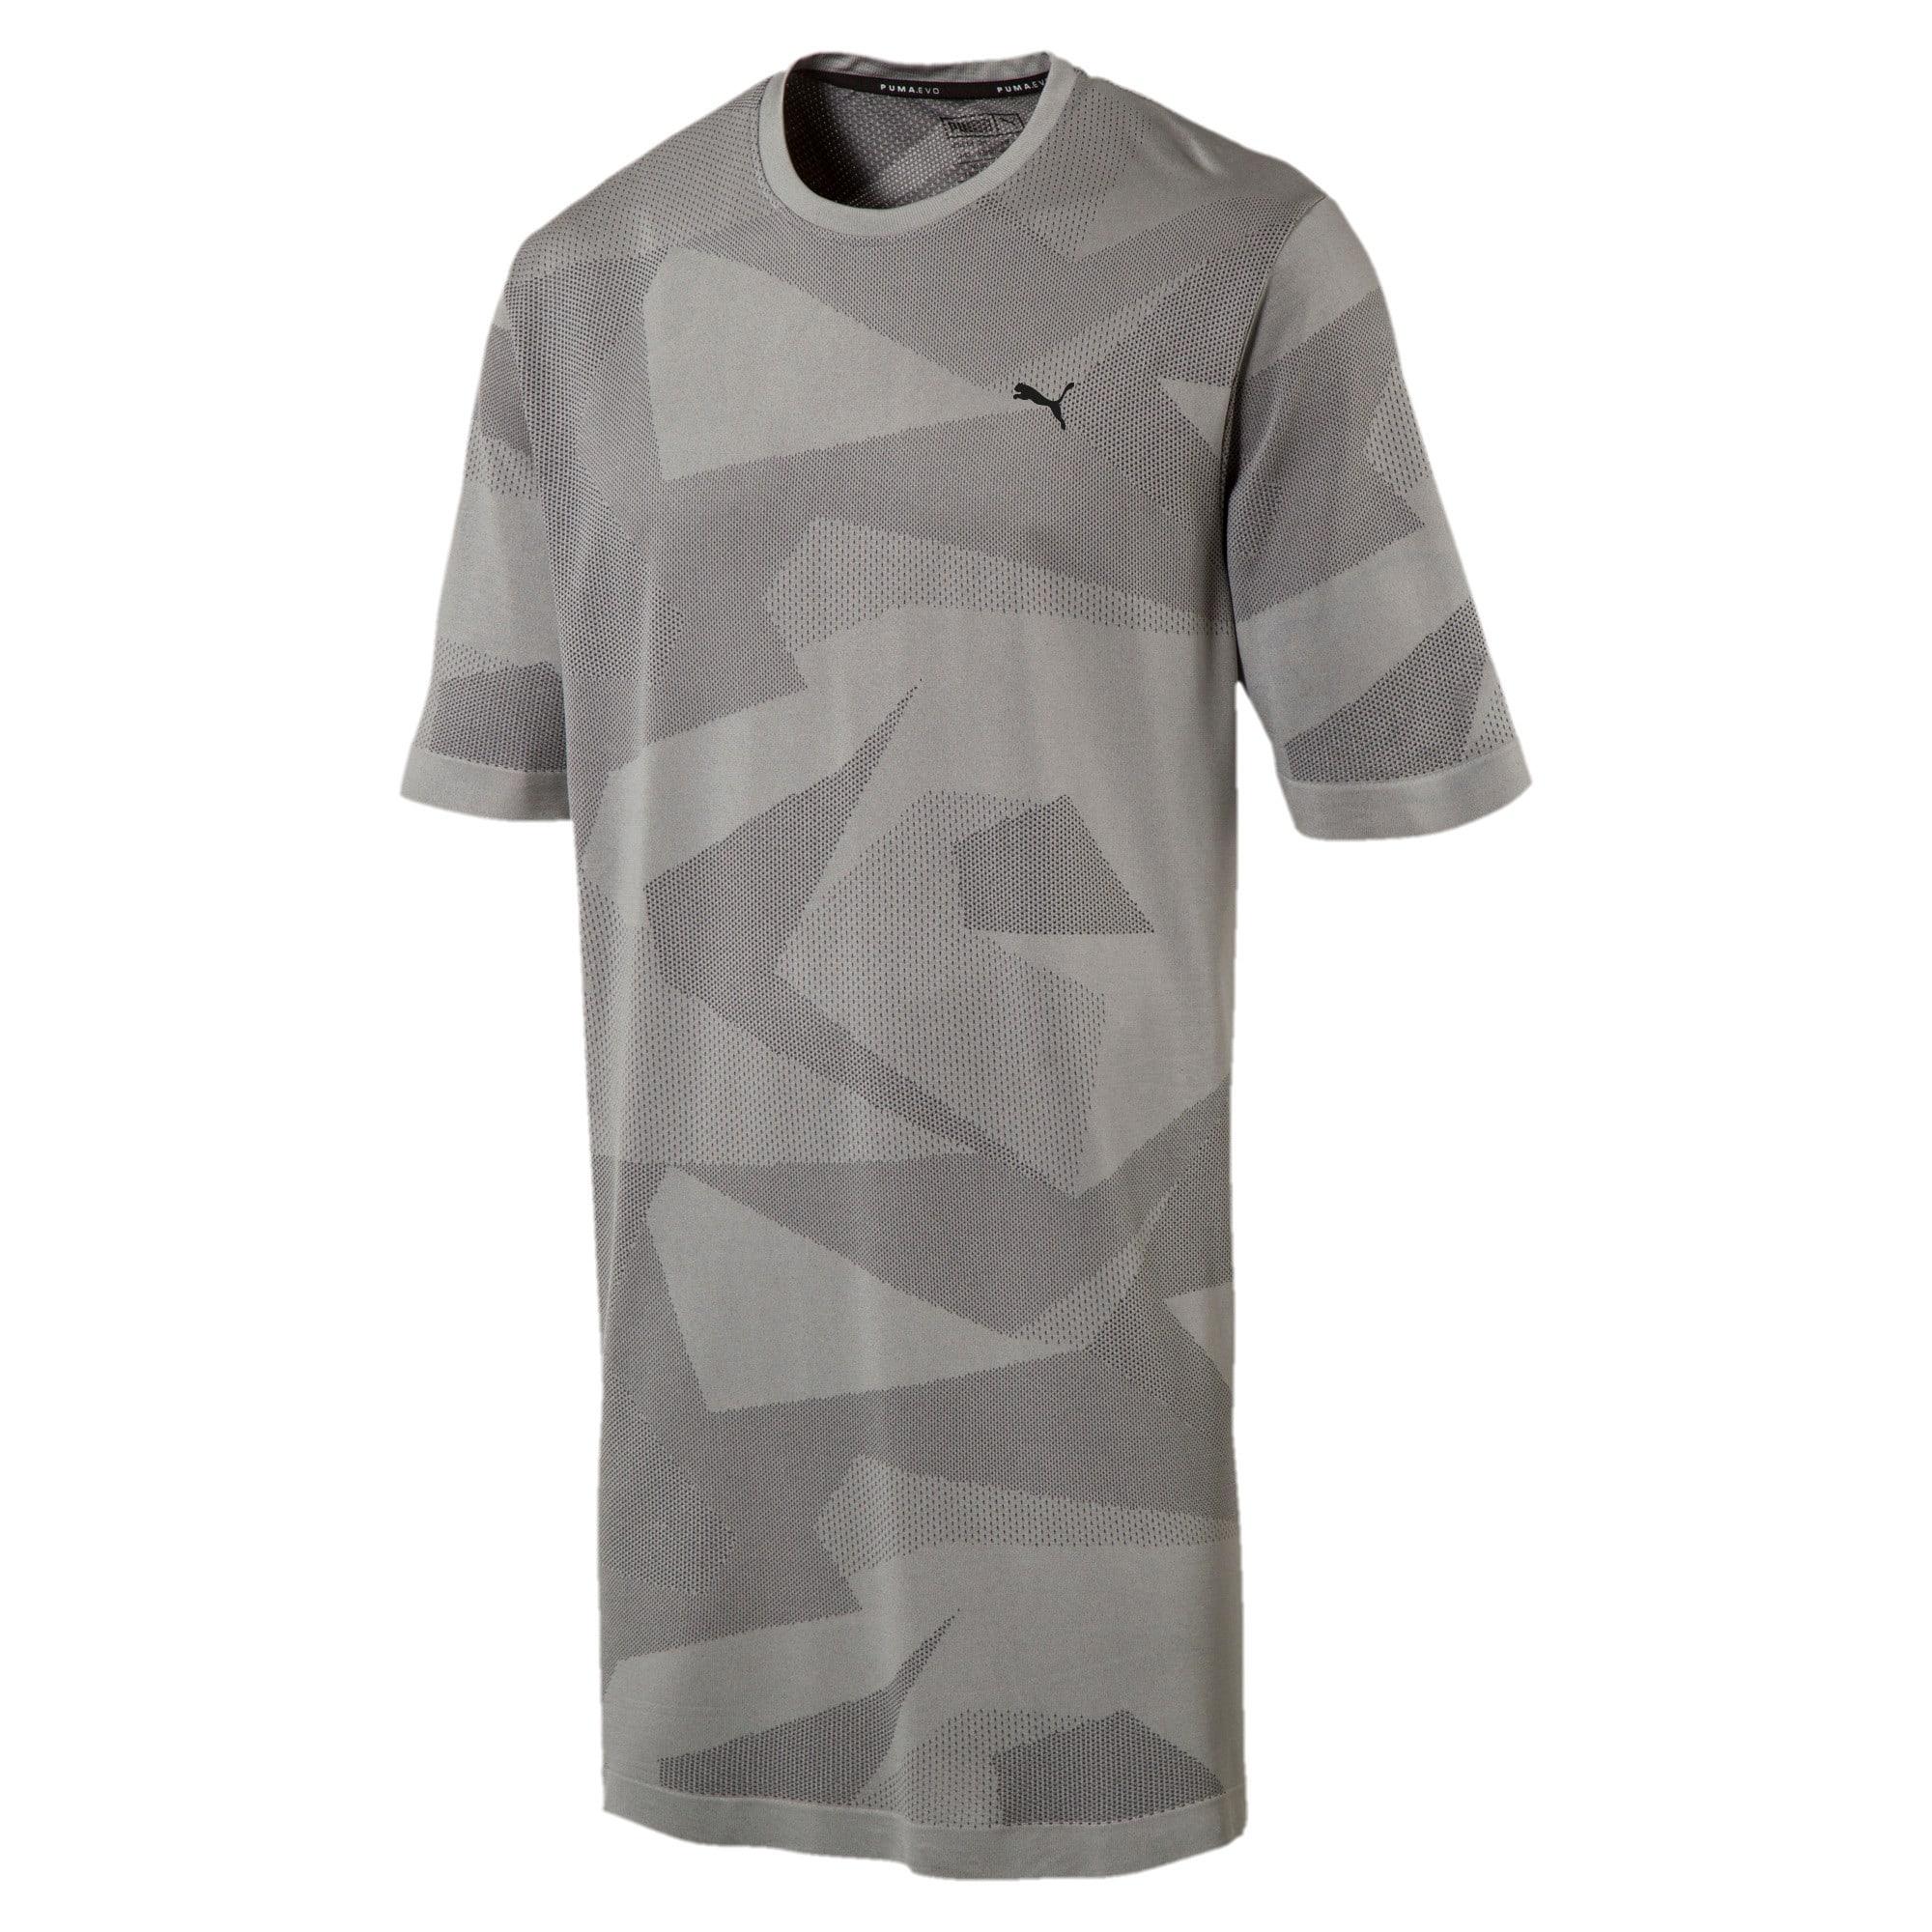 Thumbnail 4 of Evolution Men's evoKNIT Image T-Shirt, Medium Gray Heather, medium-IND